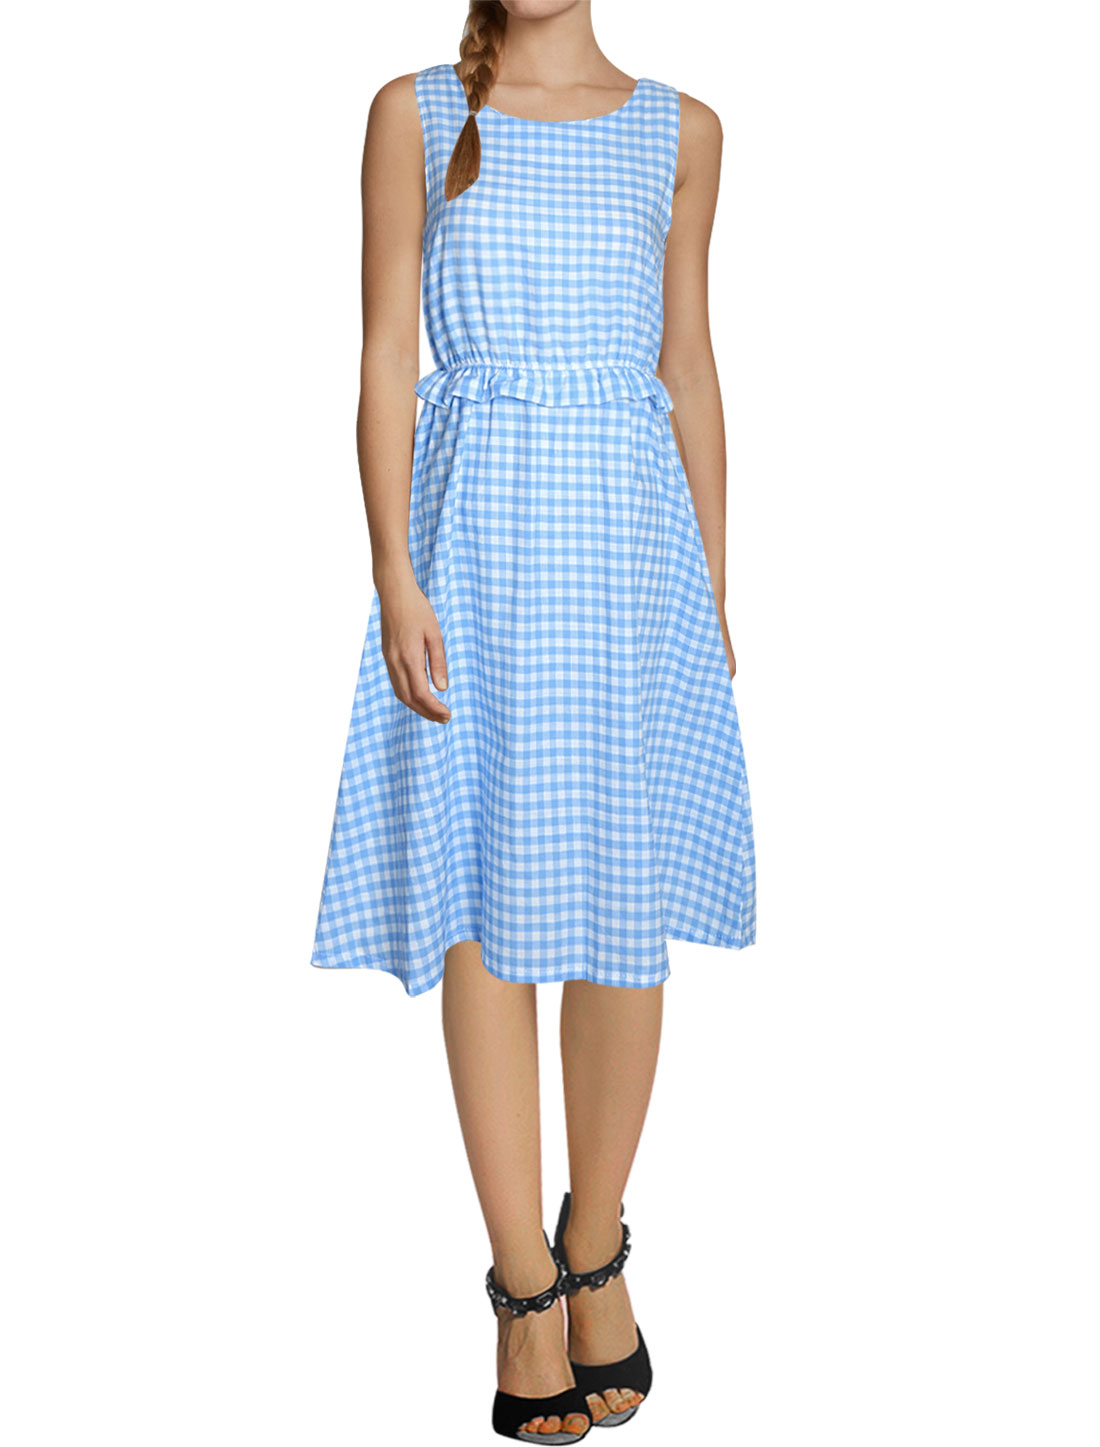 Woman Plaids Ruffled Elastic Waist Sleeveless Unlined Dress Light Blue White XS